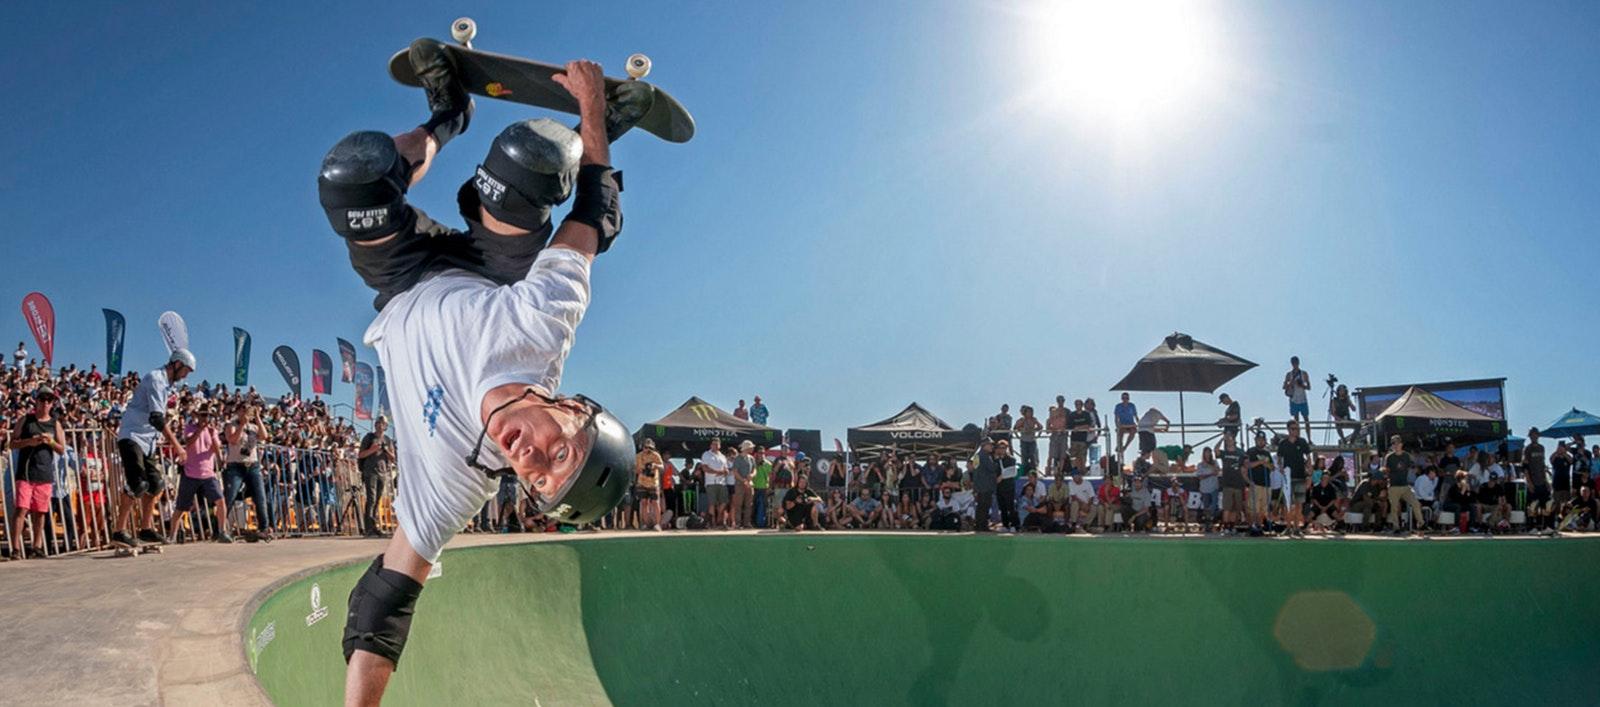 Riwayat Jatuh Bangun Tony Hawk Menekuni Olahraga Skateboard